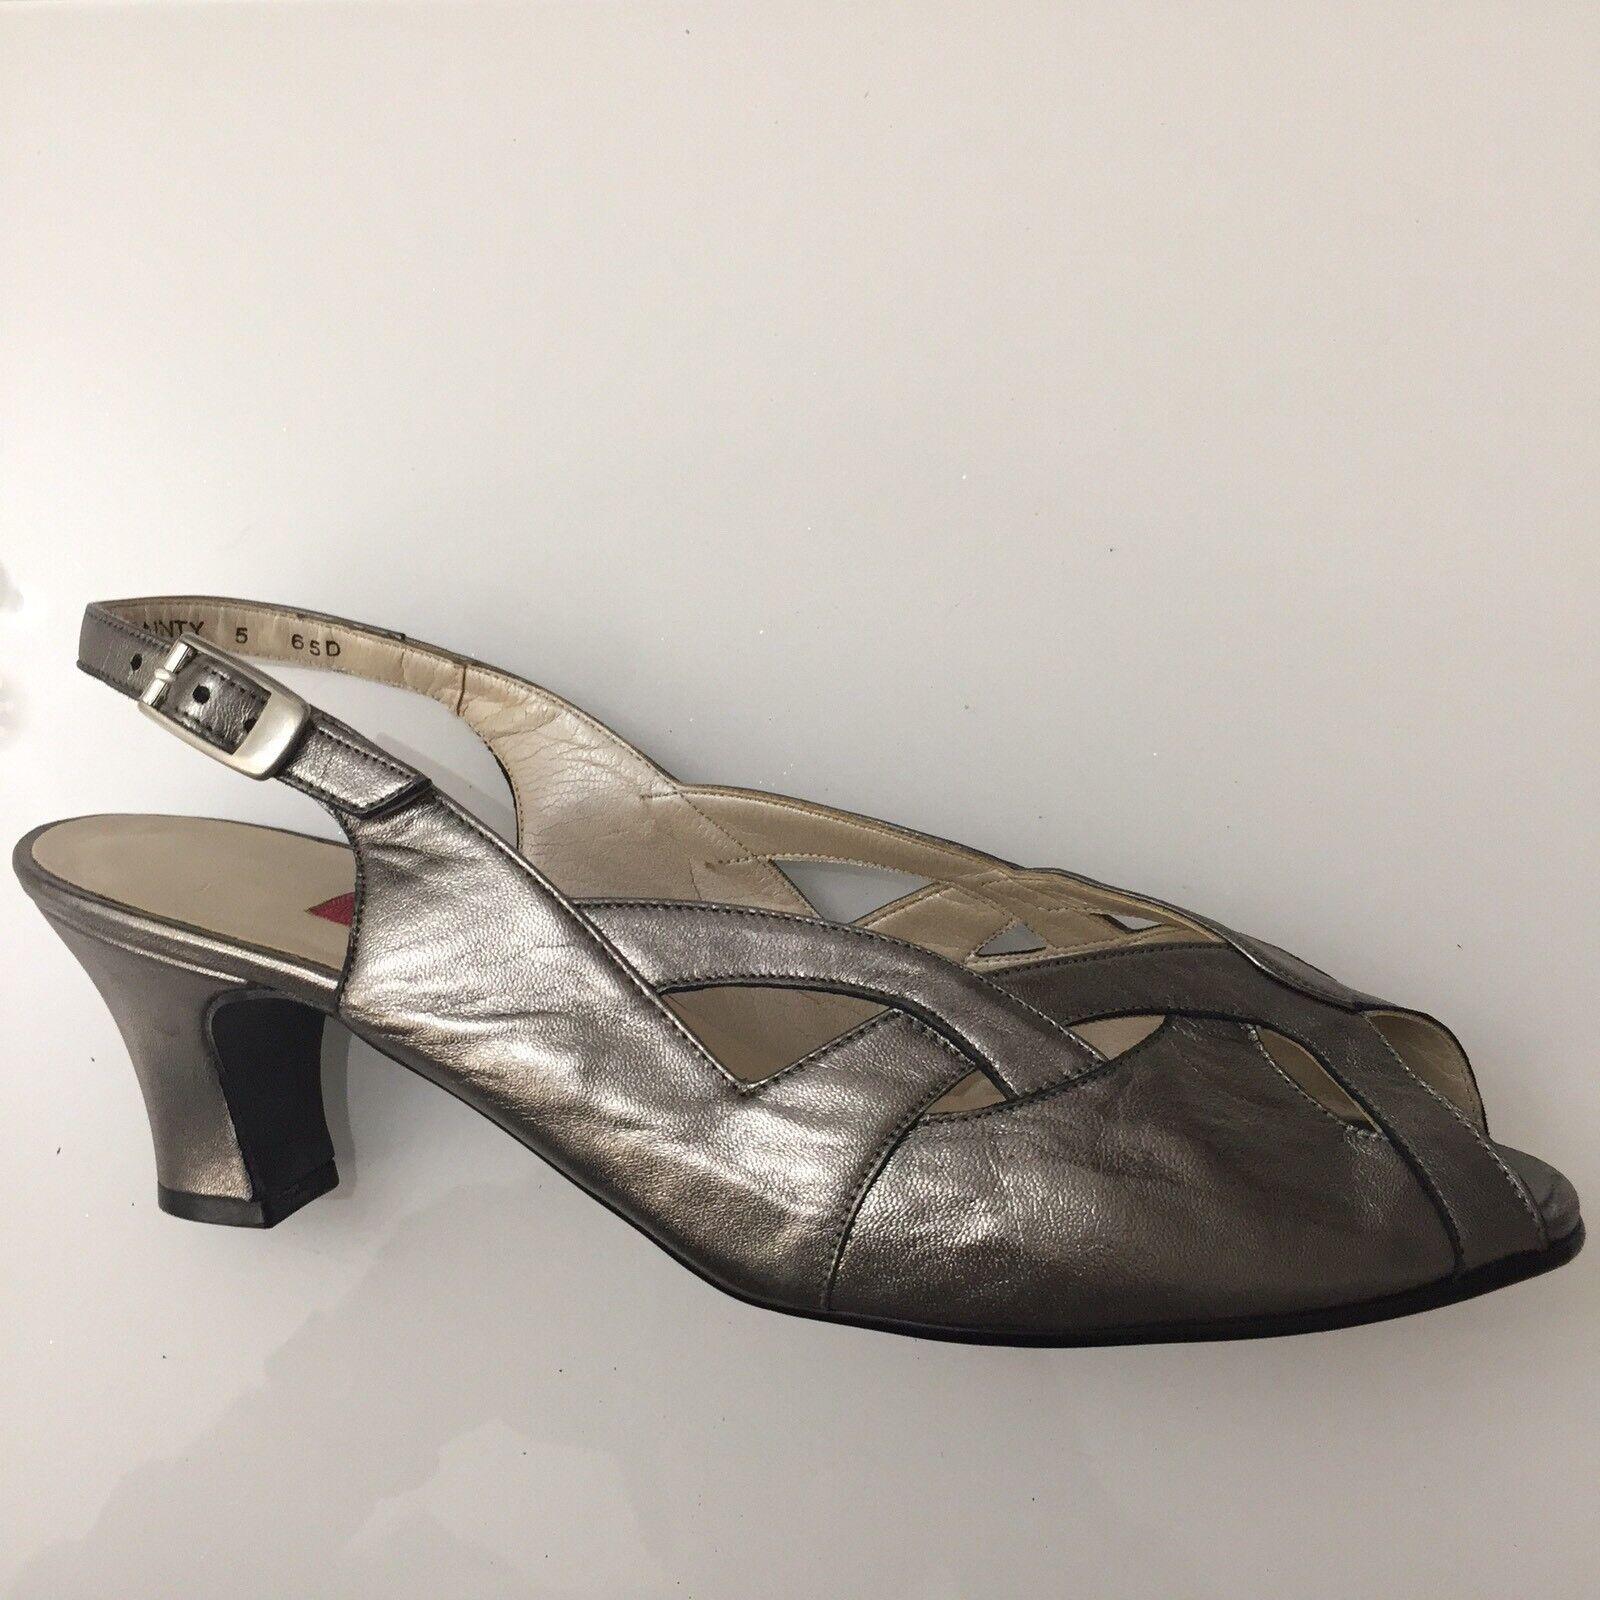 "Ladies shoes Size 5 Bronze VAN DAL Leather 2.5"" Heel Feature Front Peep Toe"